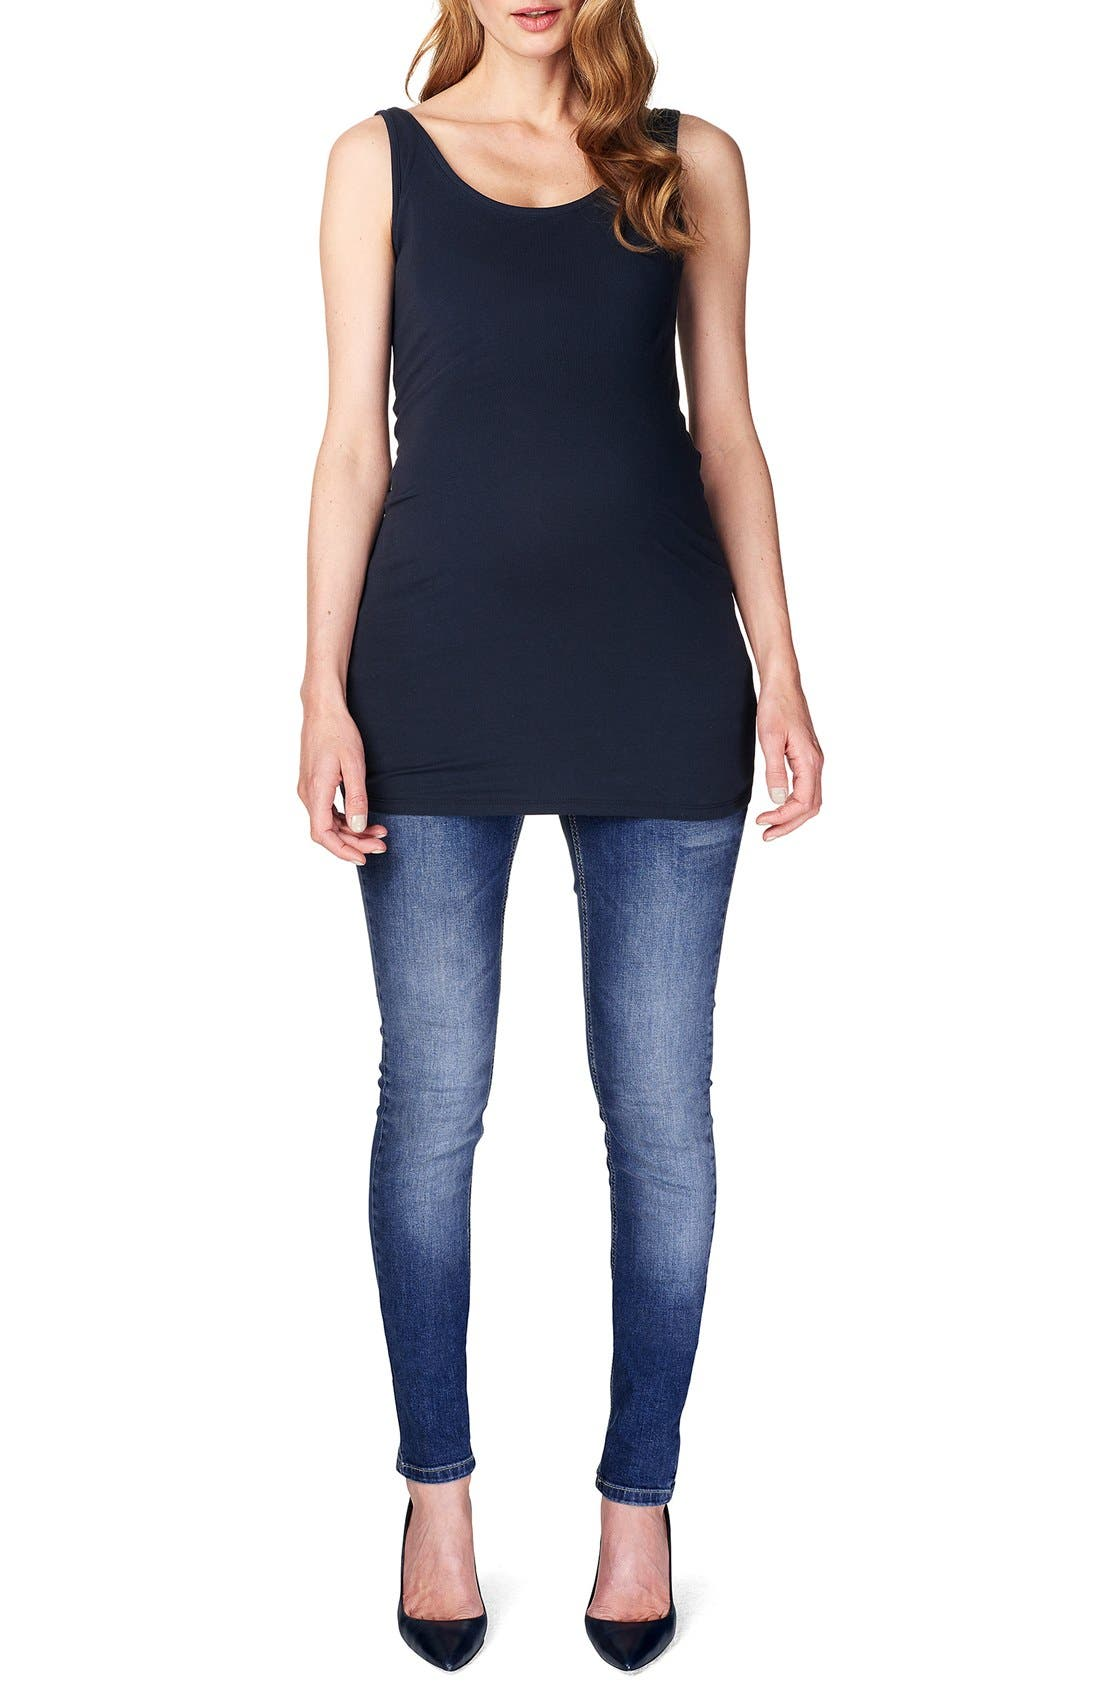 NOPPIES 'Amsterdam' Scoop Neck Long Maternity Top, Main, color, DARK BLUE